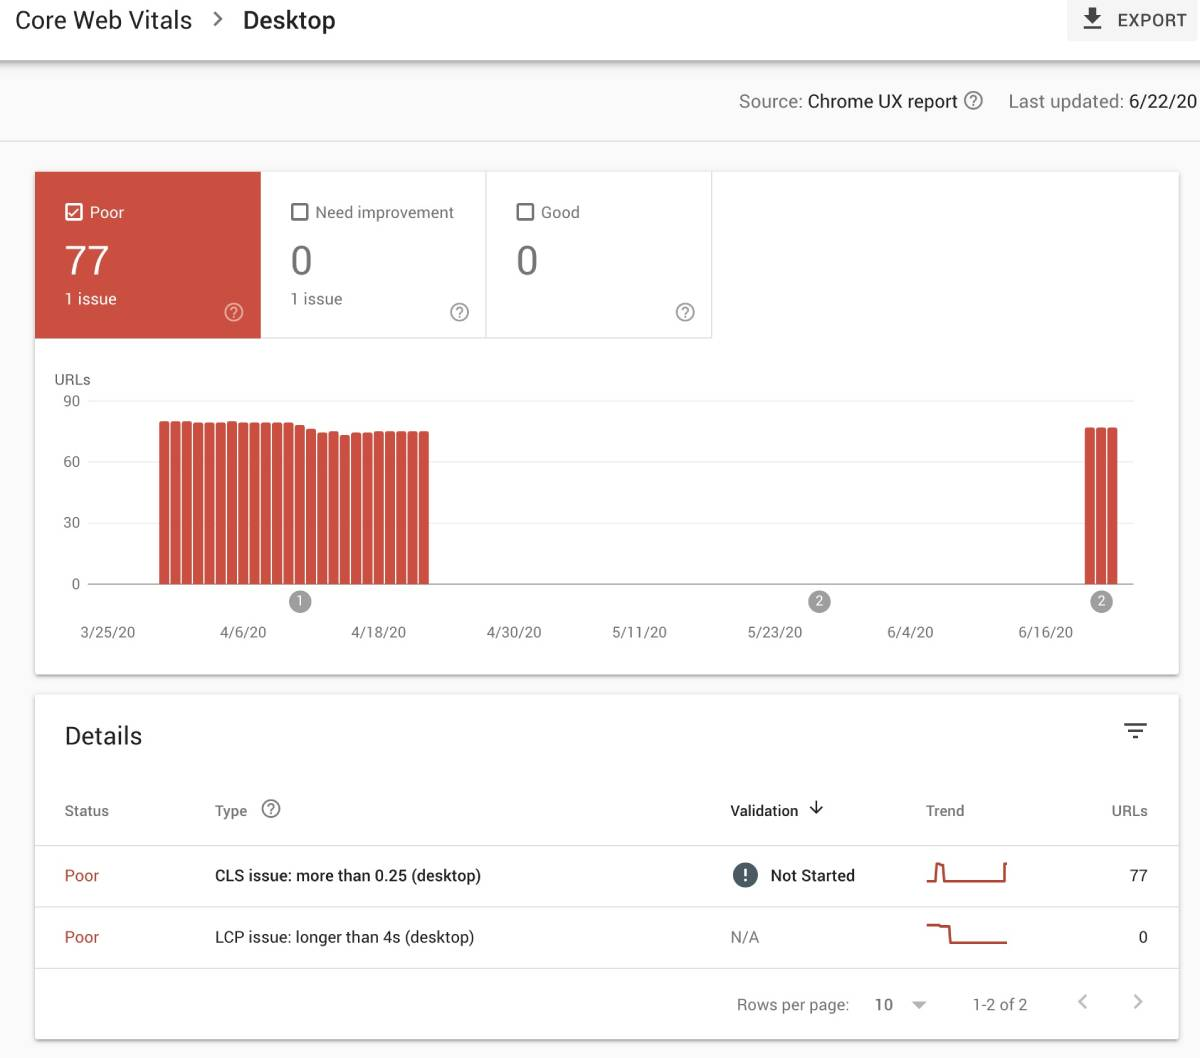 core web vitals screen in gsc